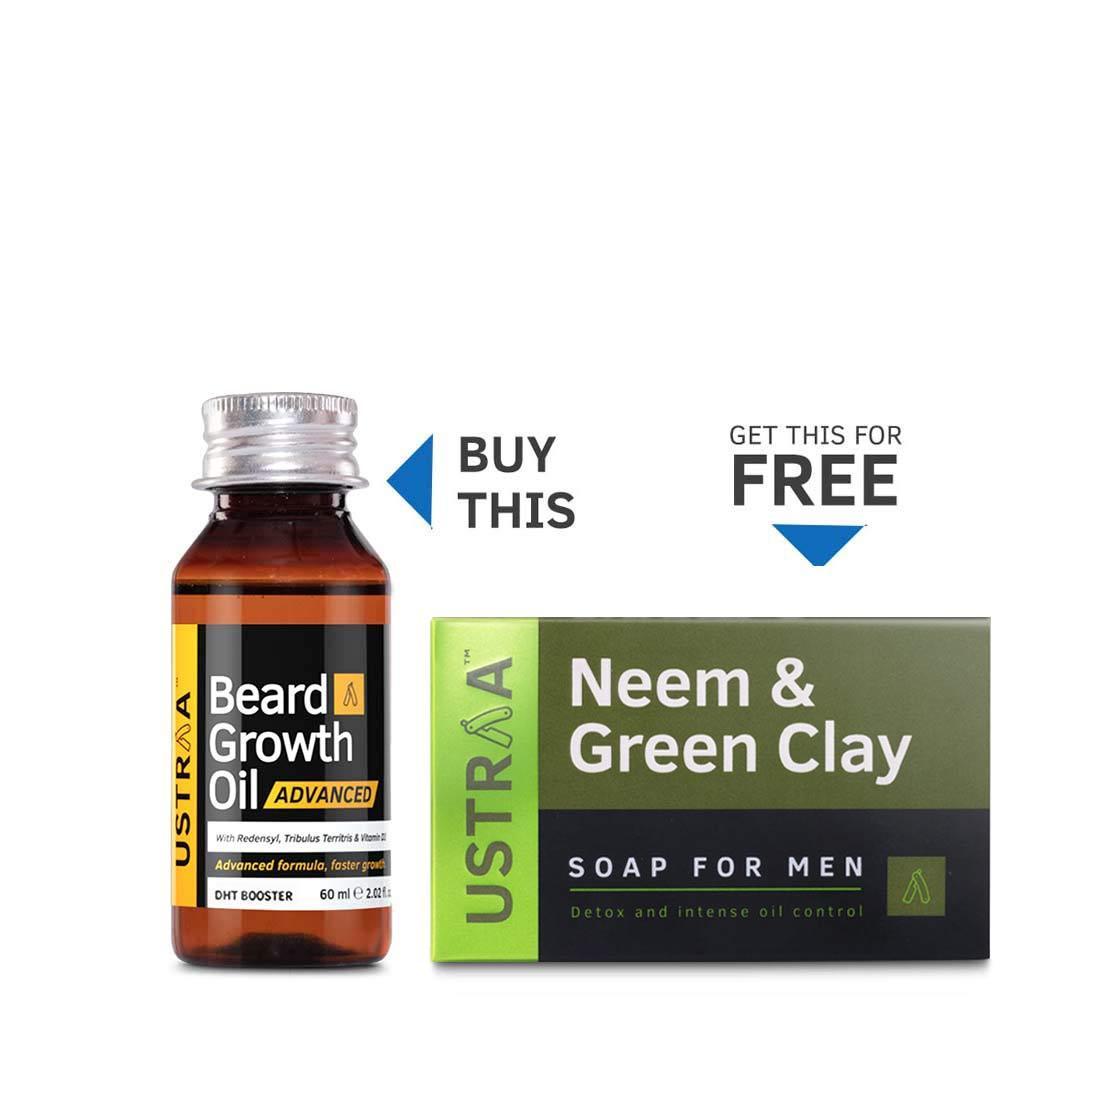 Beard Growth Oil- Advanced (Get Neem & Green Clay Deo Soap Free)